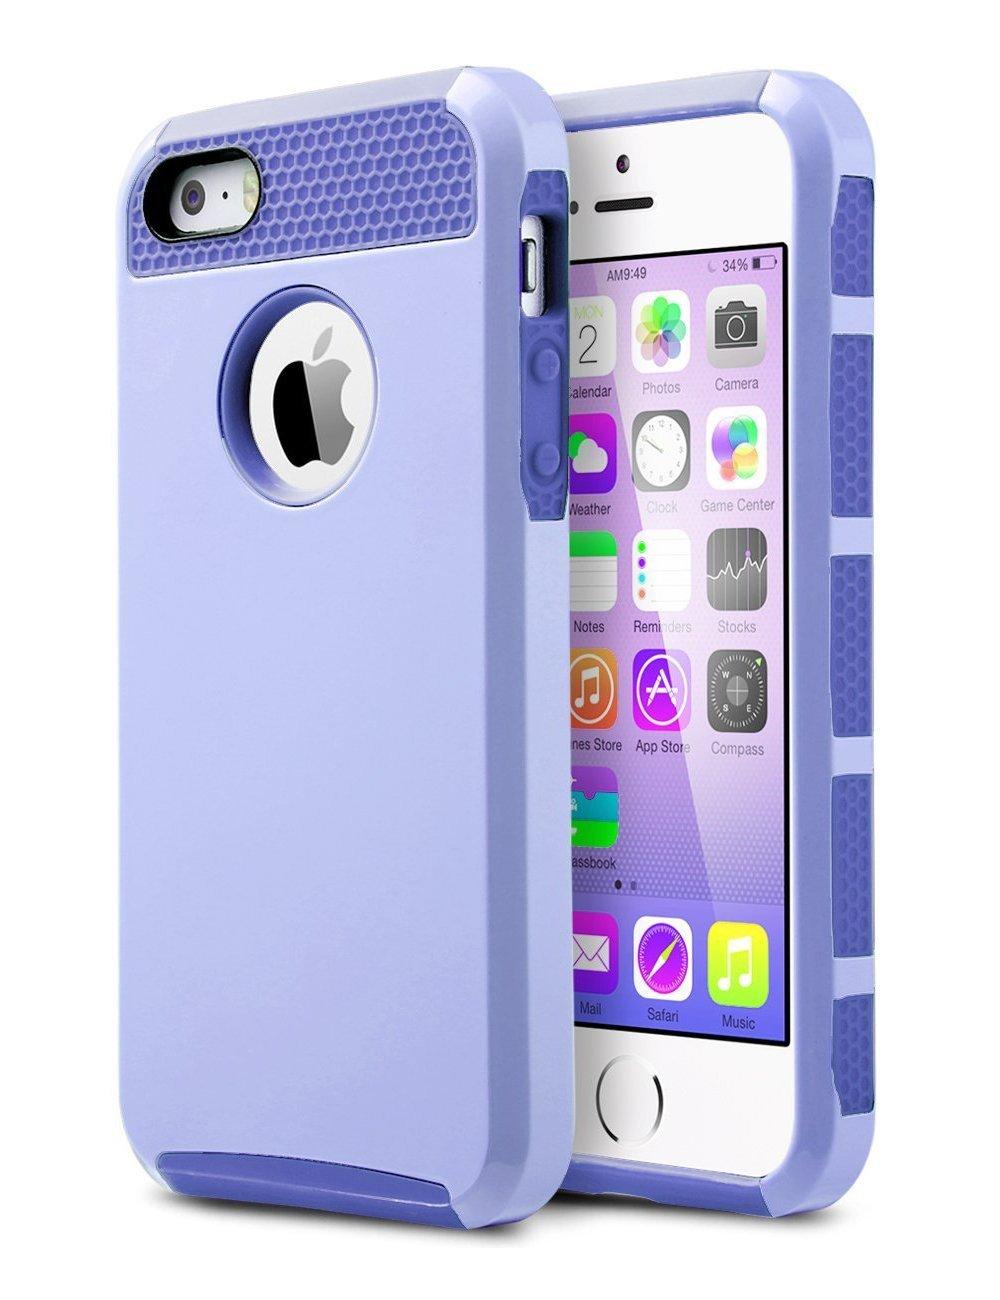 Iphone 5S Case Iphone 5 Caseiphone Se Case Ulak Slim Fit Protection Case Shoc.. 18